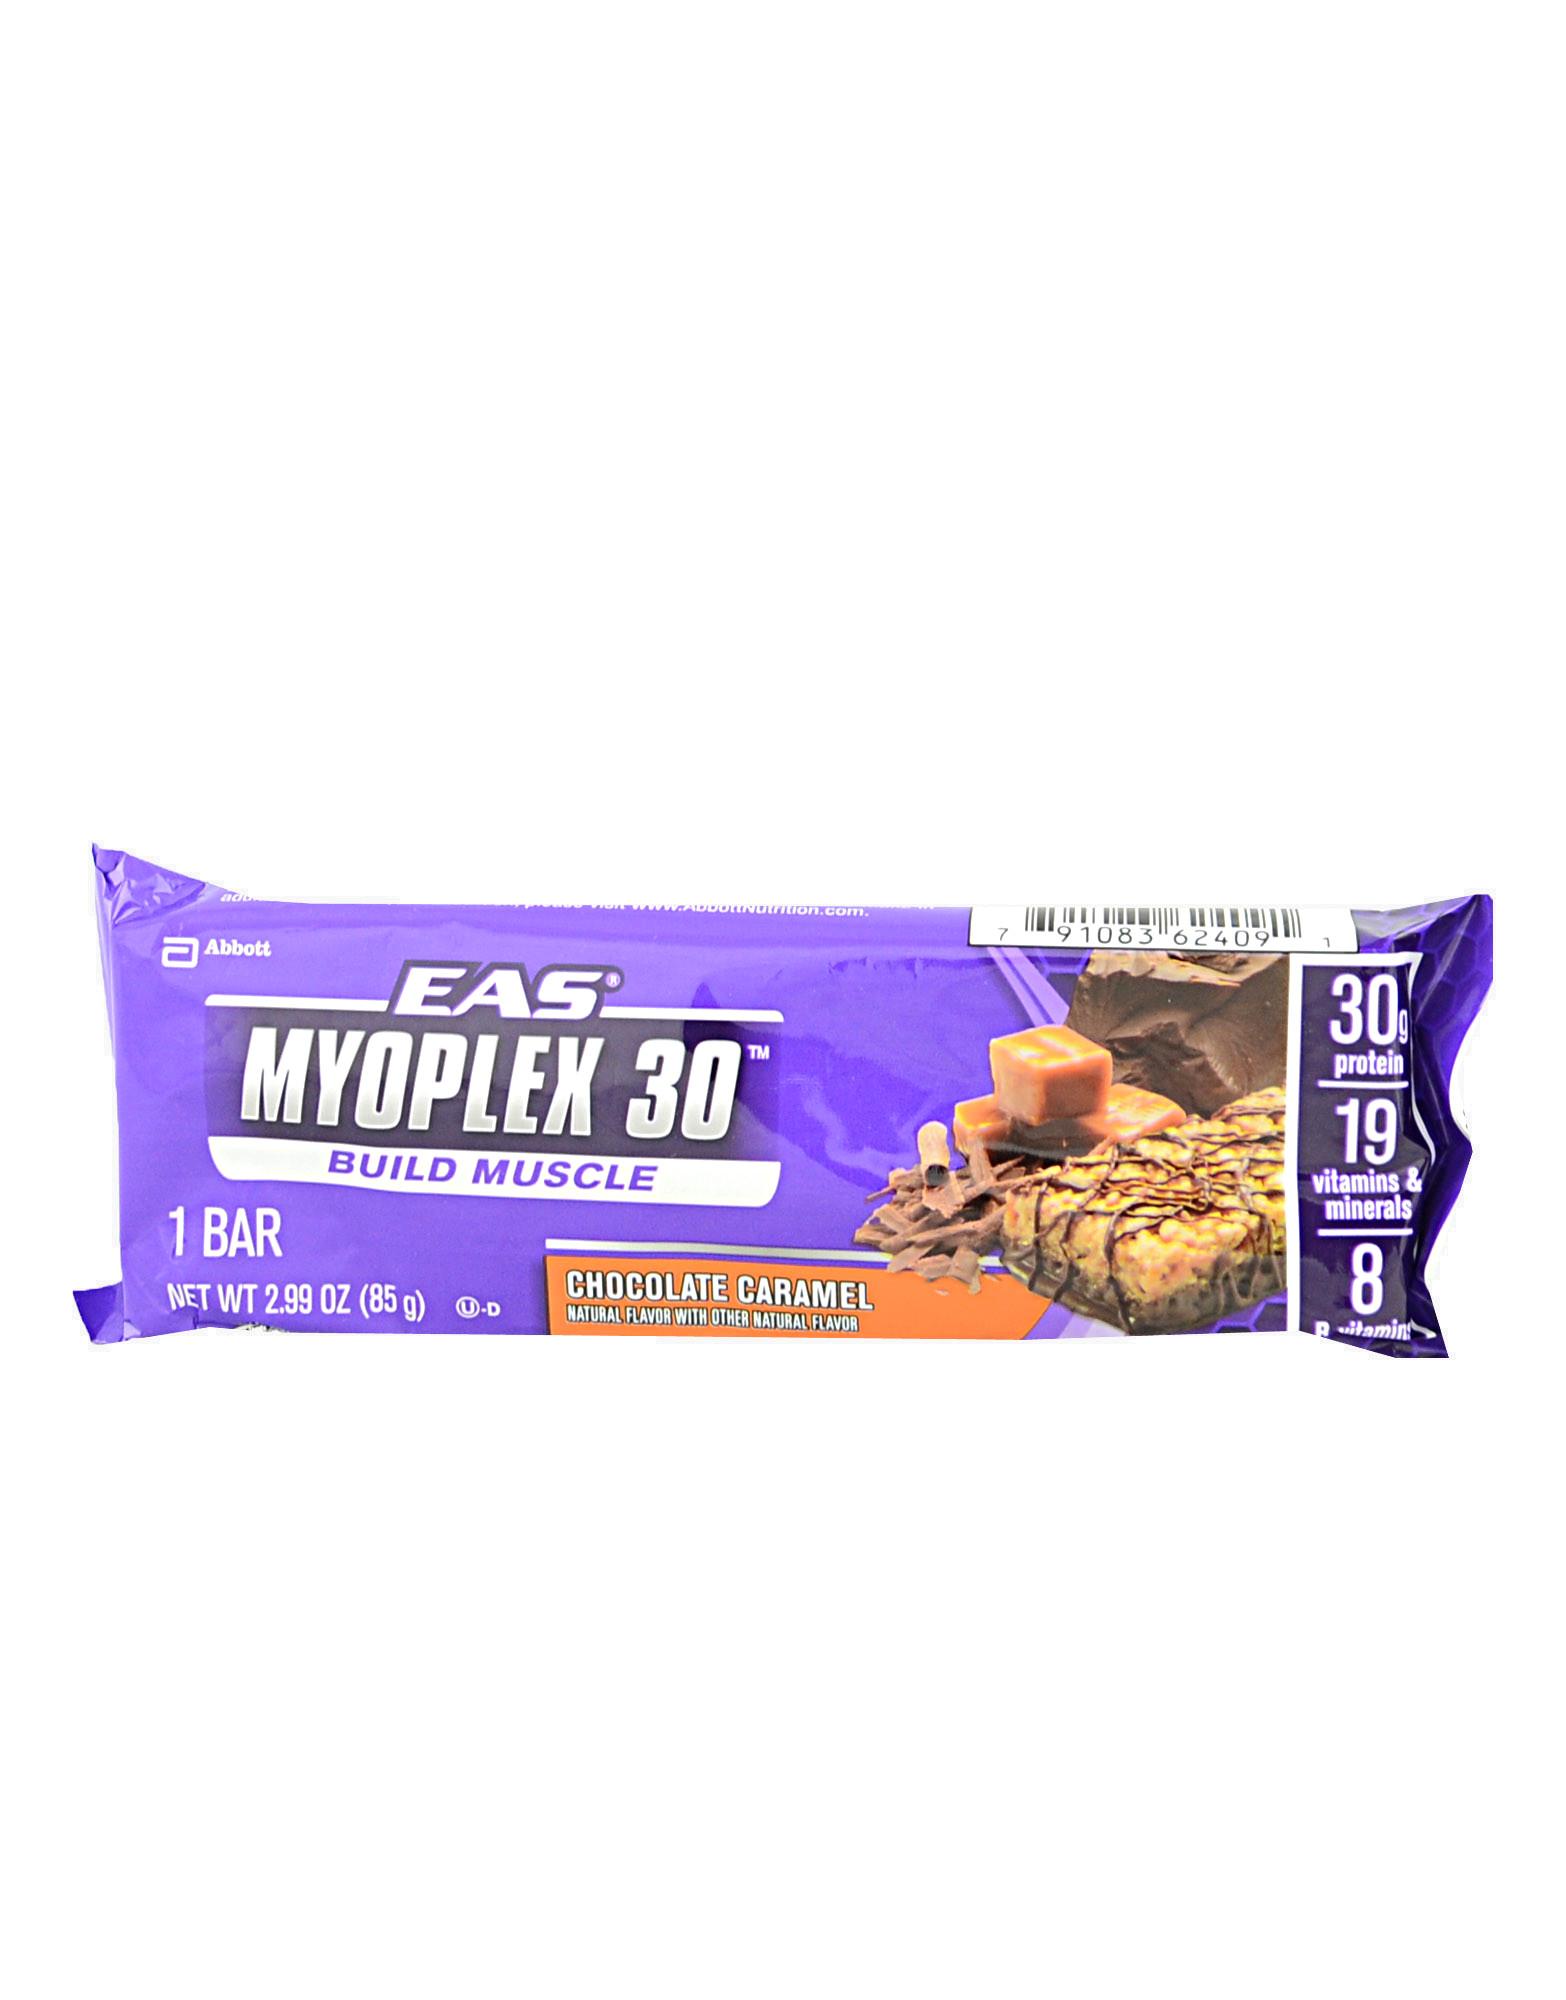 Eas myoplex 30